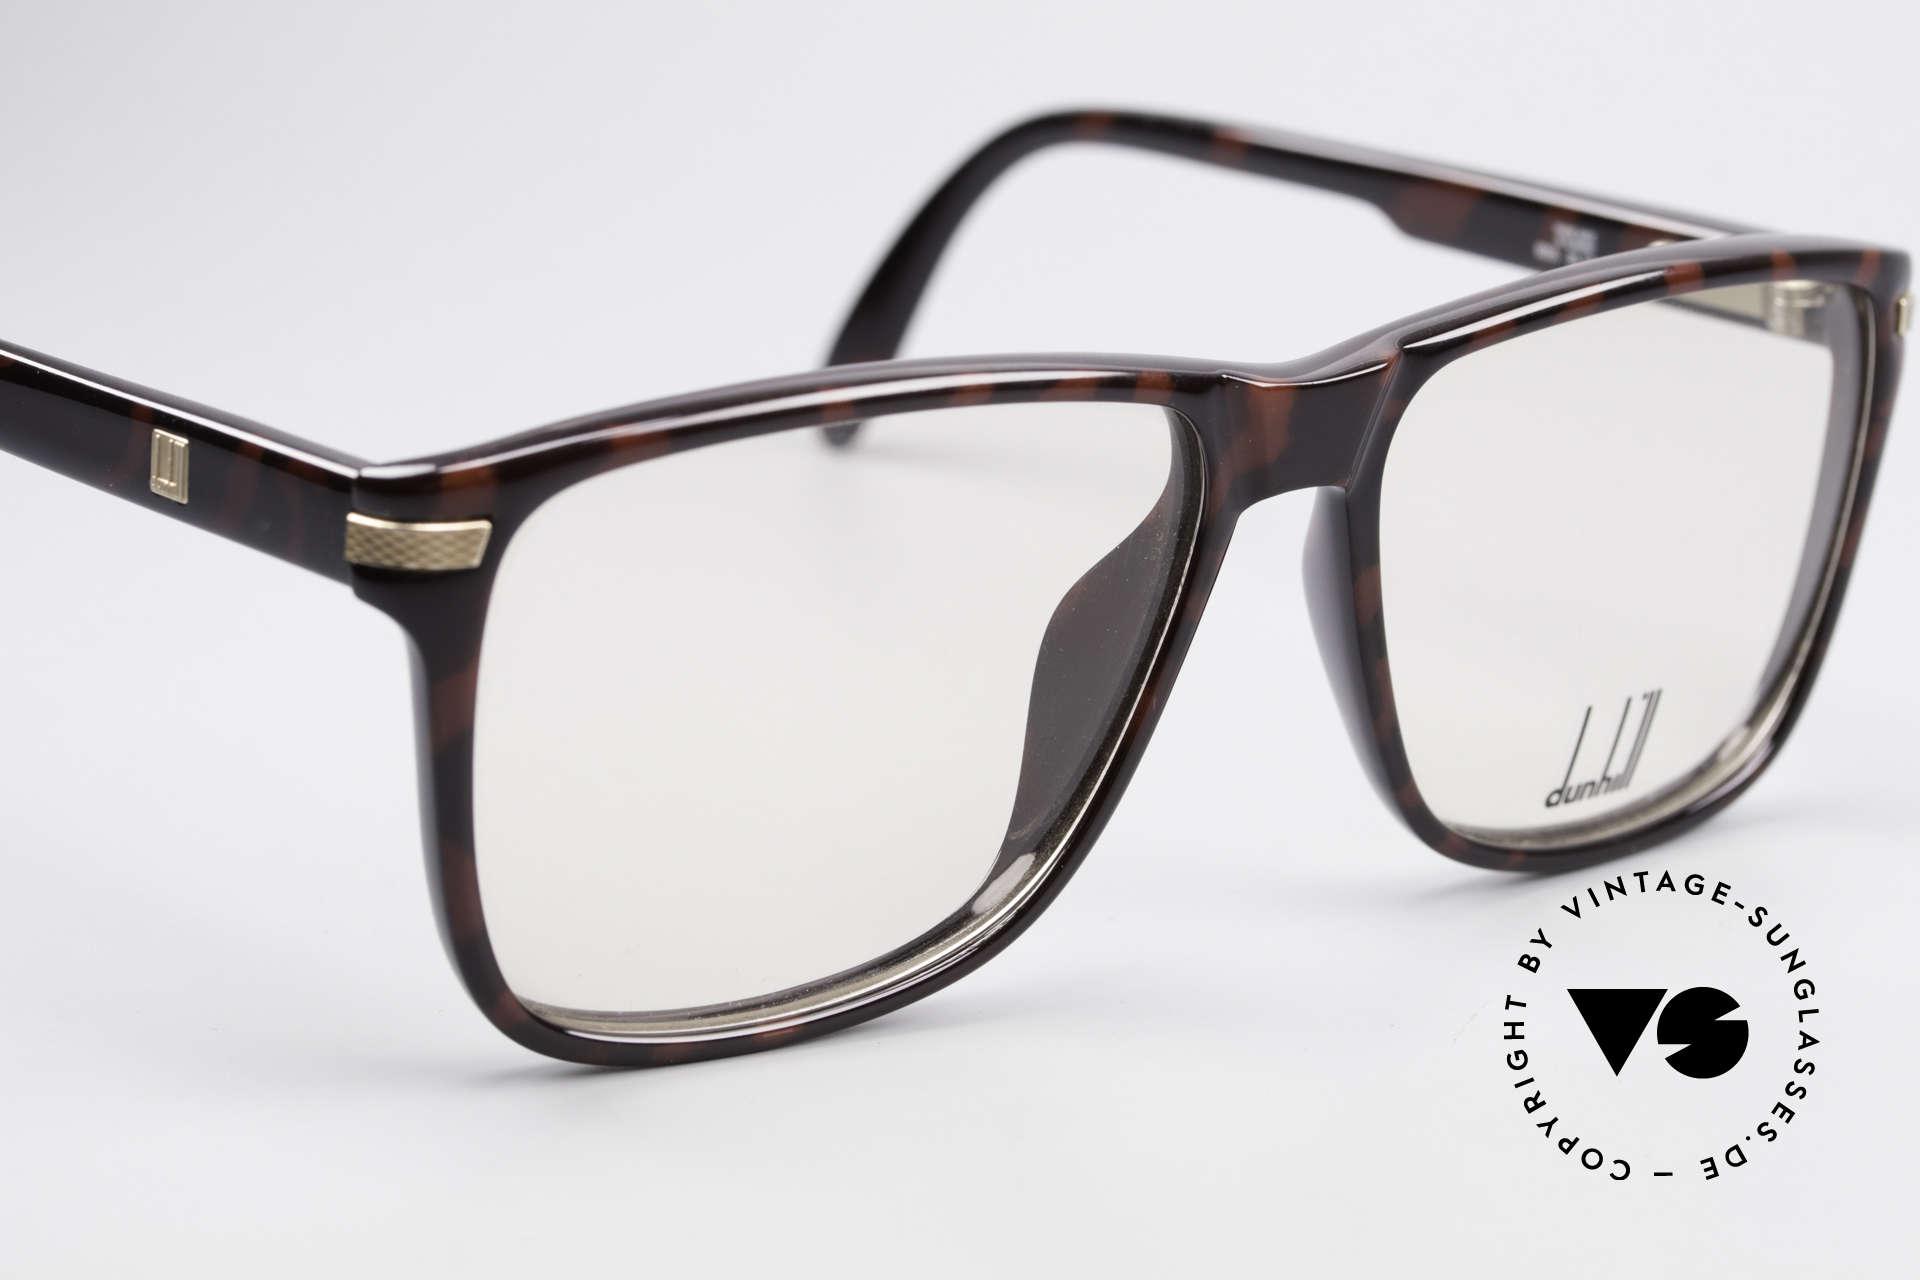 Dunhill 6055 Johnny Depp Nerd Style Frame, NO RETRO eyewear, but an ORIGINAL old rarity, Made for Men